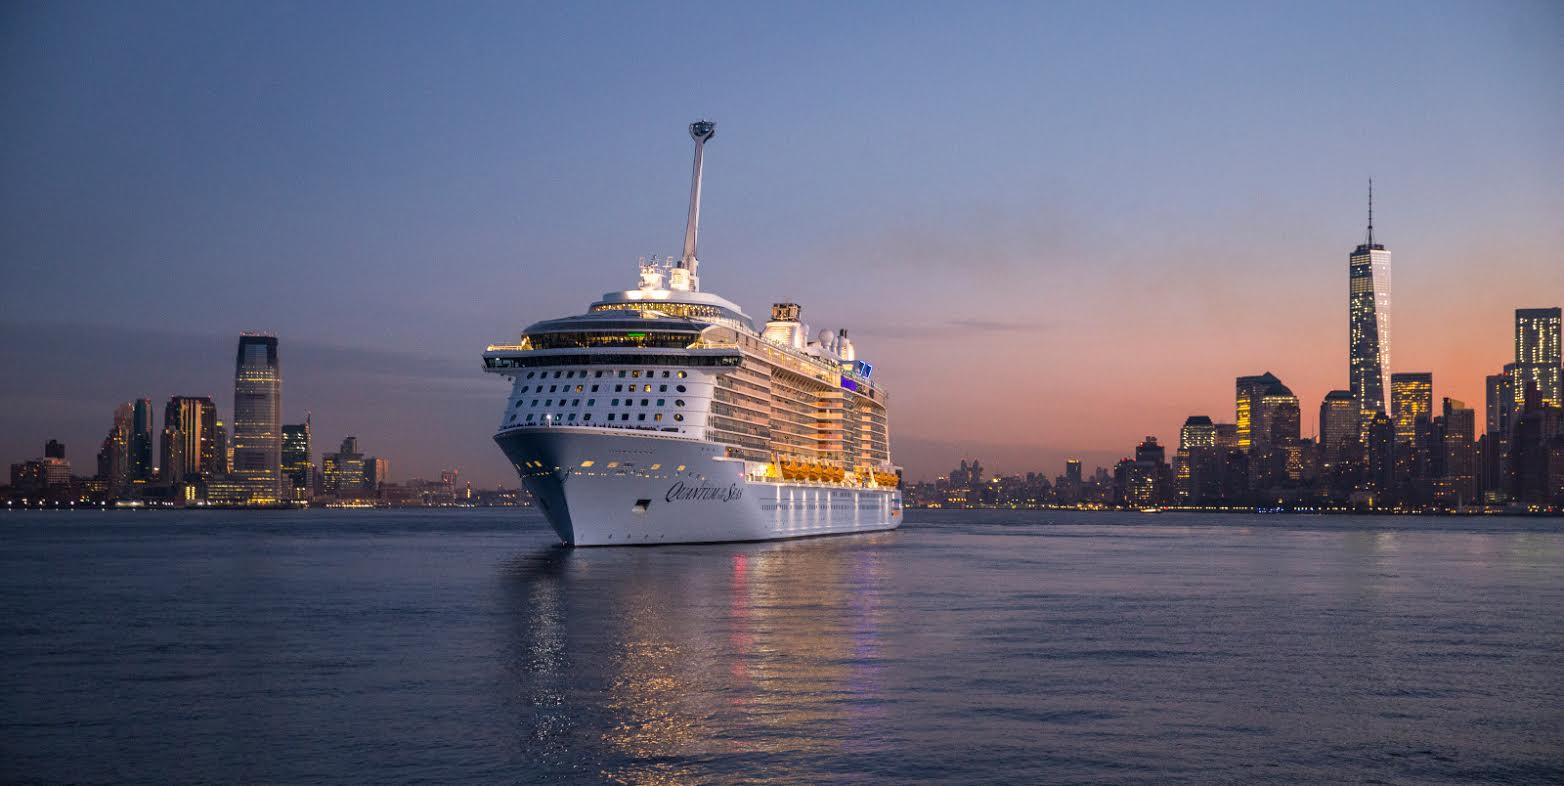 Quantum of the Seas - ensimmäinen saapuminen New Yorkiin 10.11.2014. Copyright Royal Caribbean International